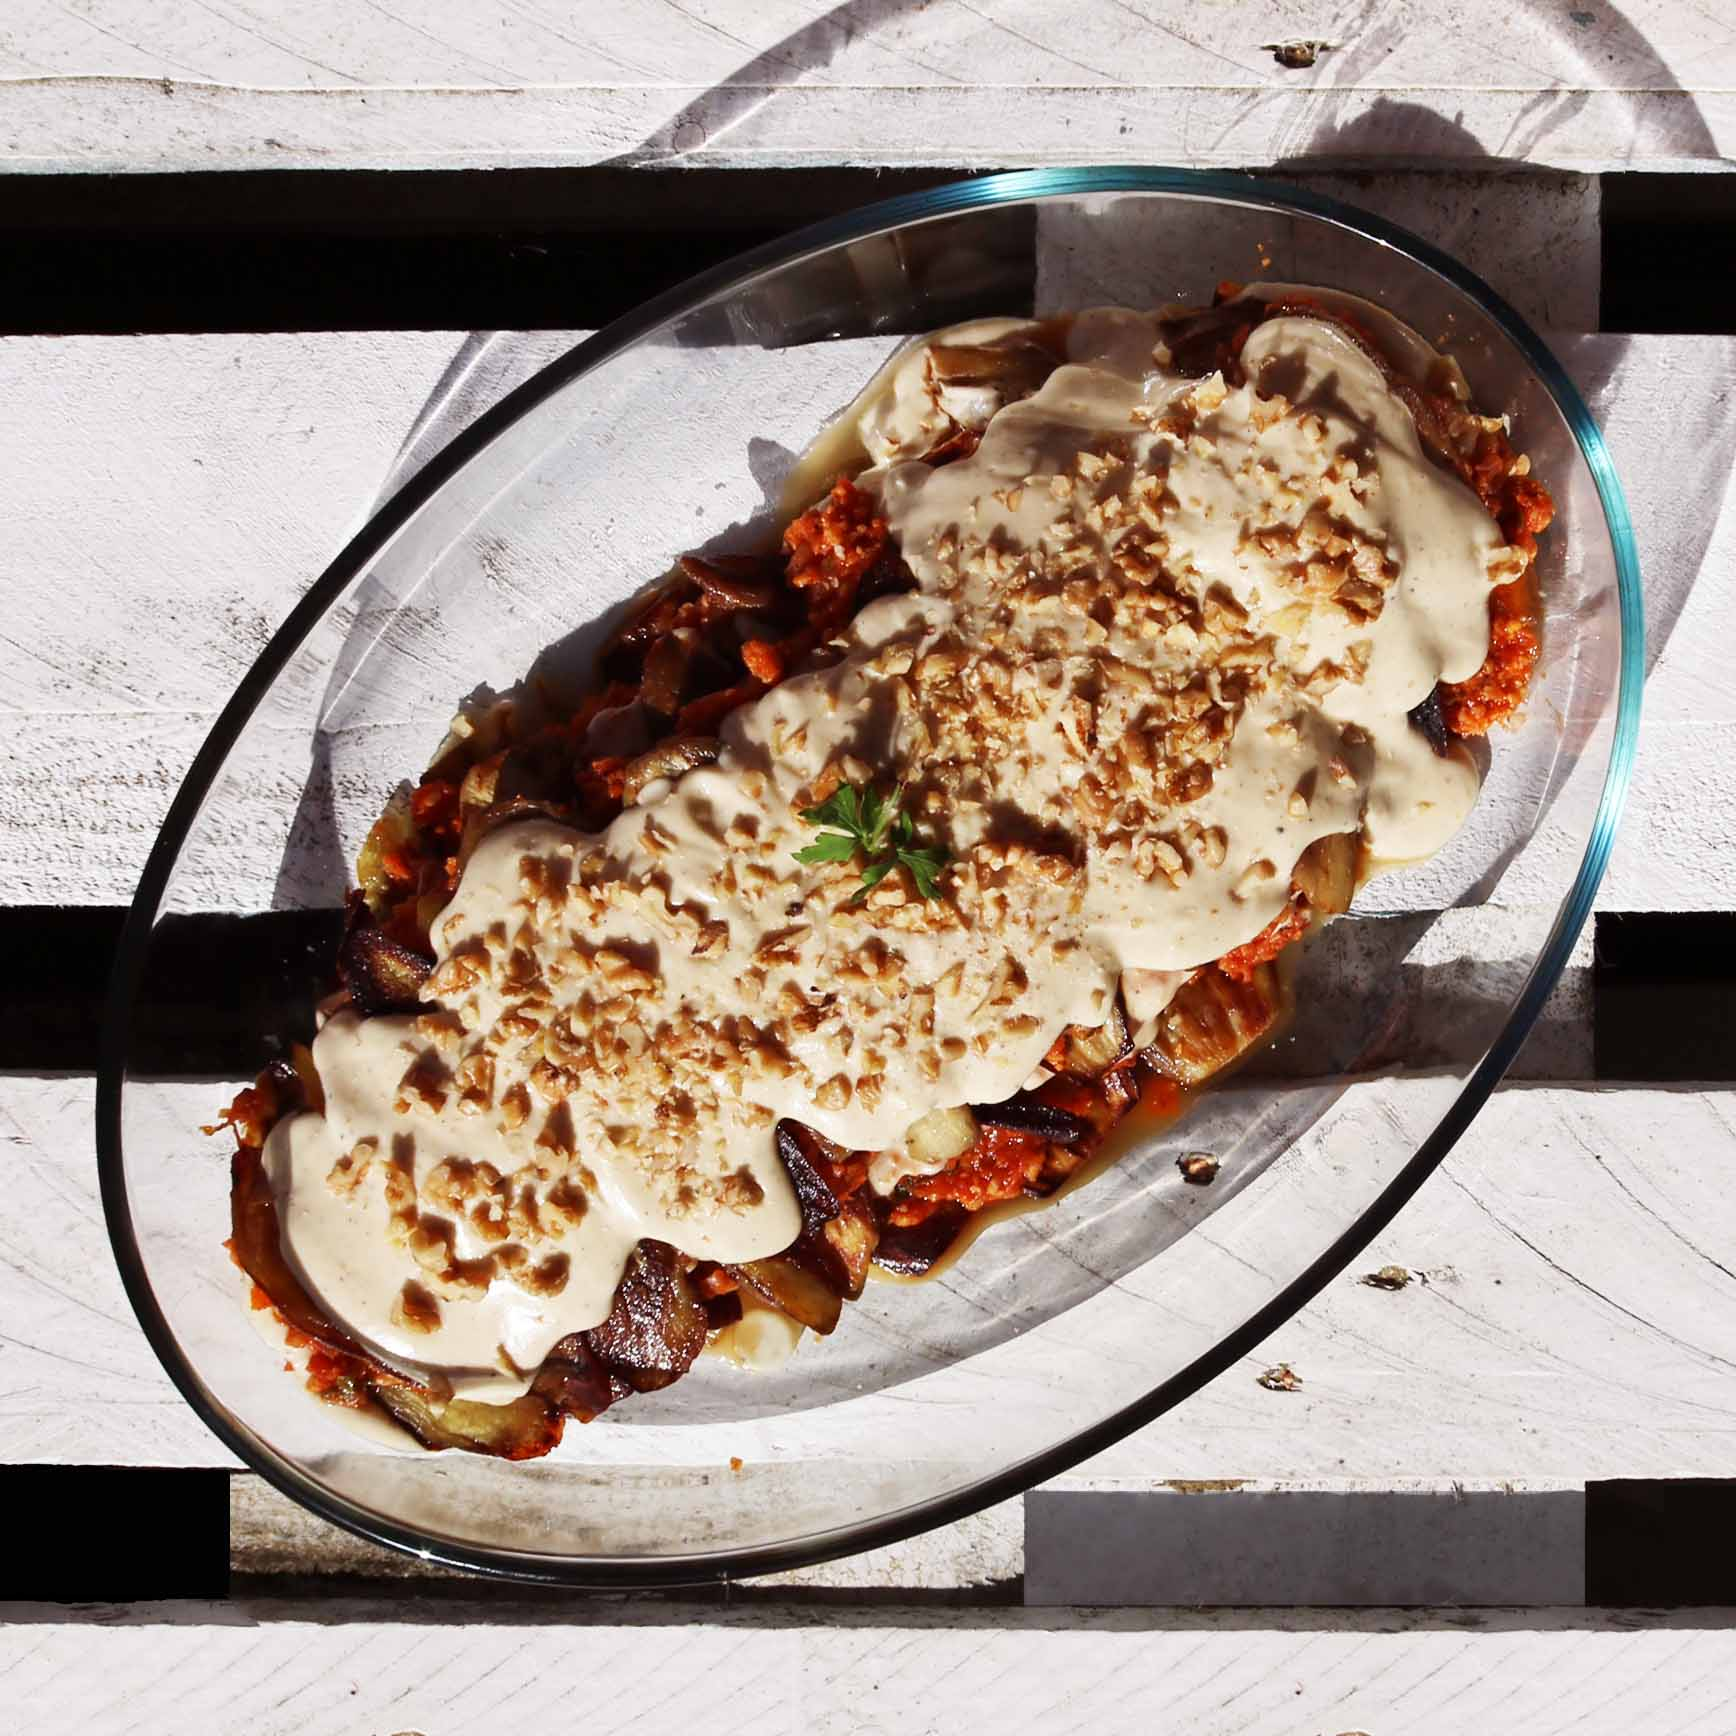 Receta vegana de musaka griega con bechamel sin gluten